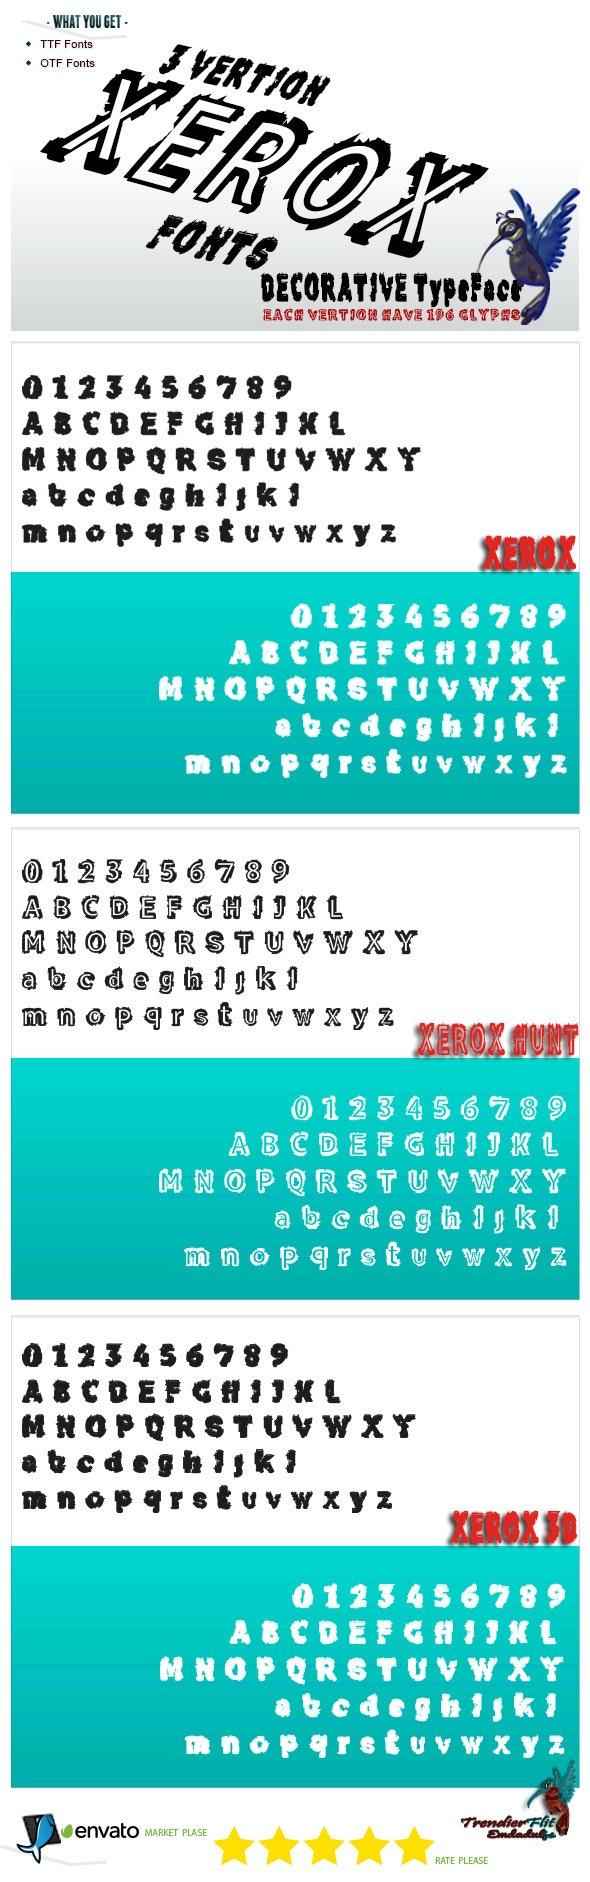 Xerox - Decorative Fonts